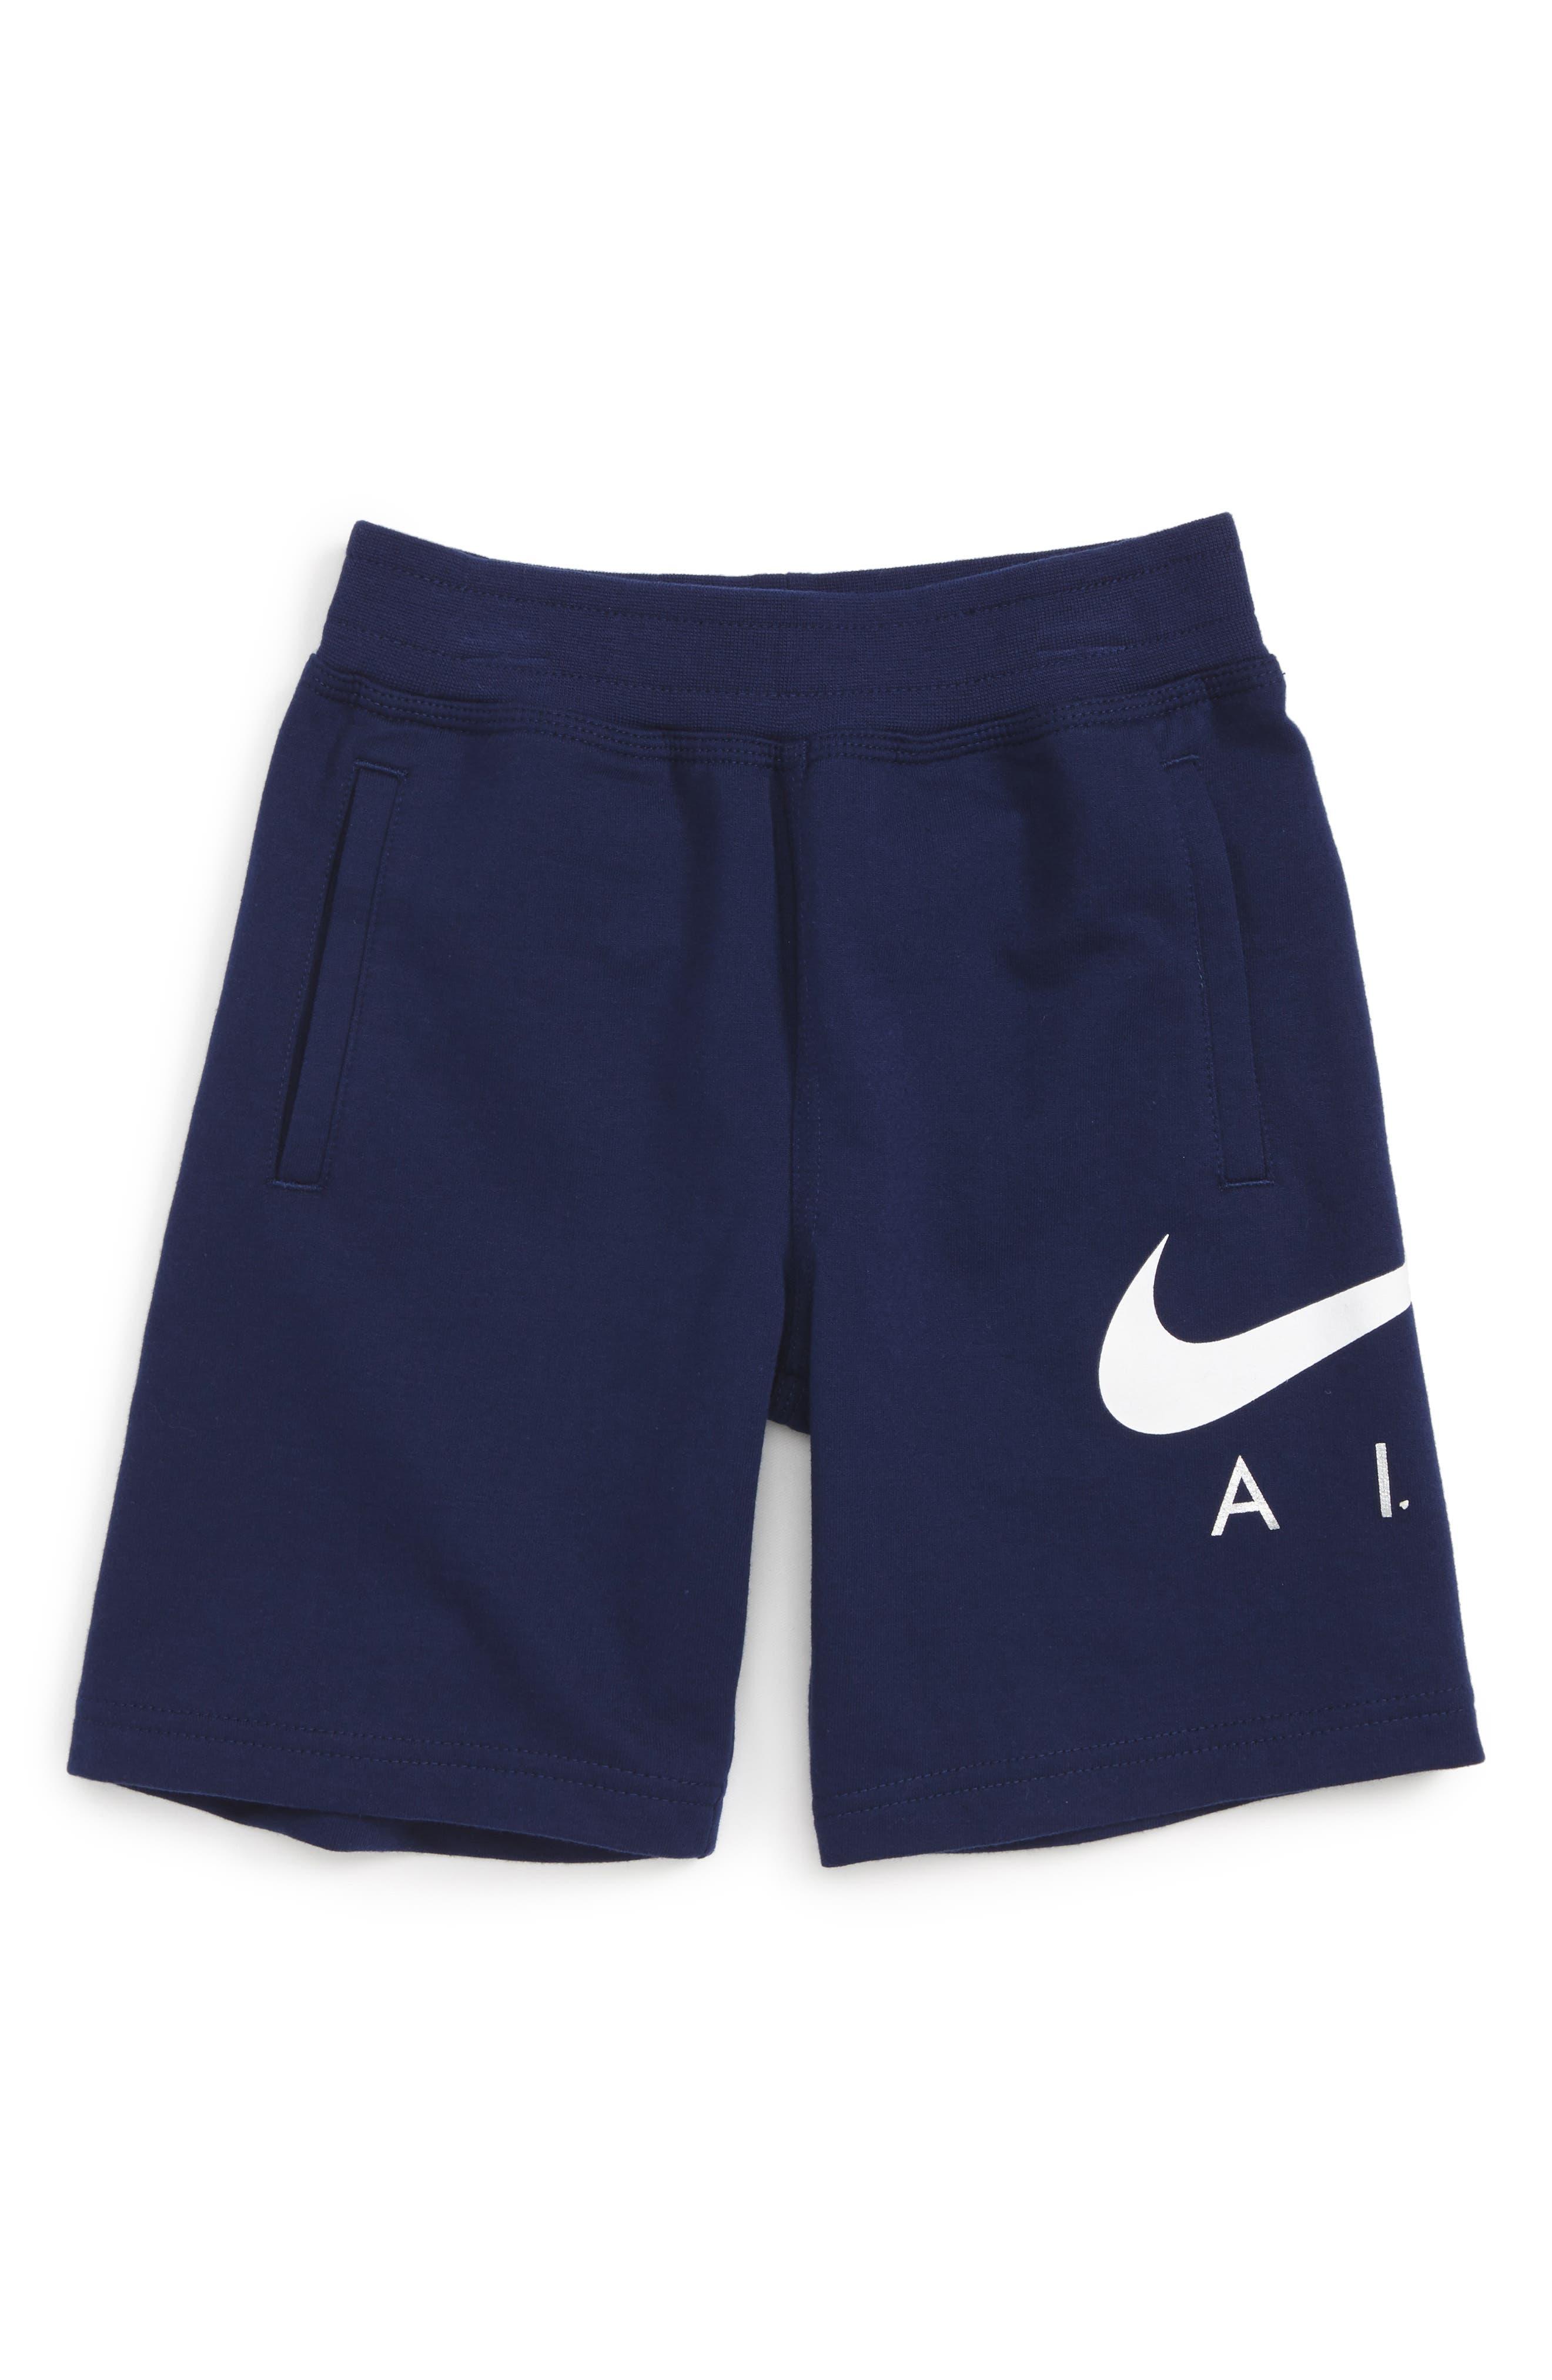 Nike Air Shorts (Toddler Boys & Little Boys)